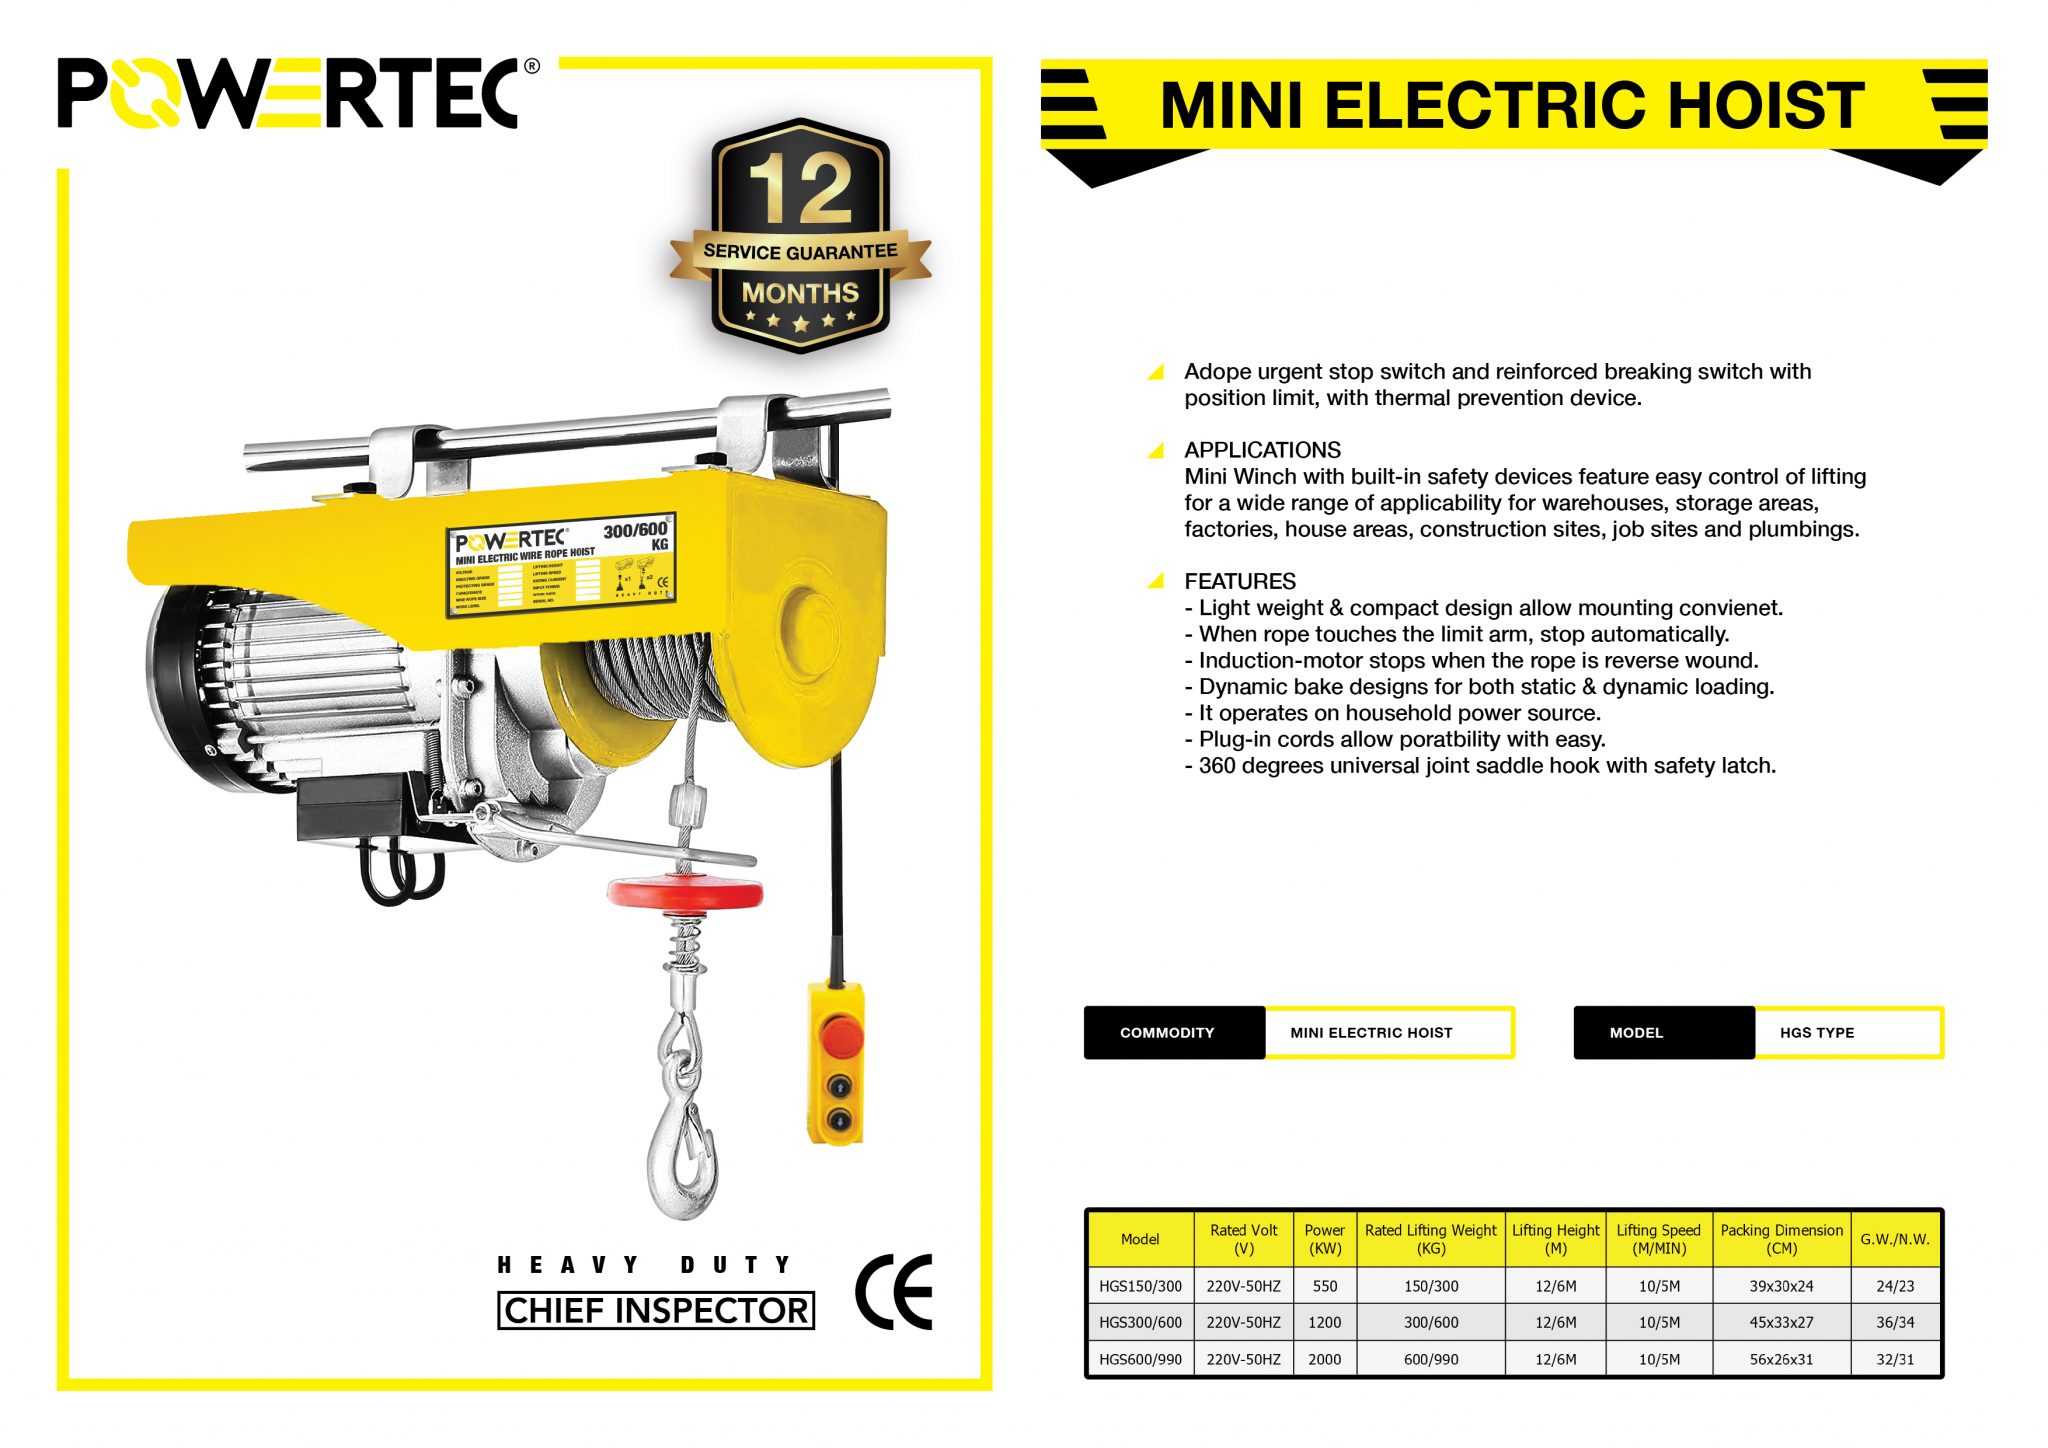 POWERTEC MINI ELECTRIC HOIST BROCHURE